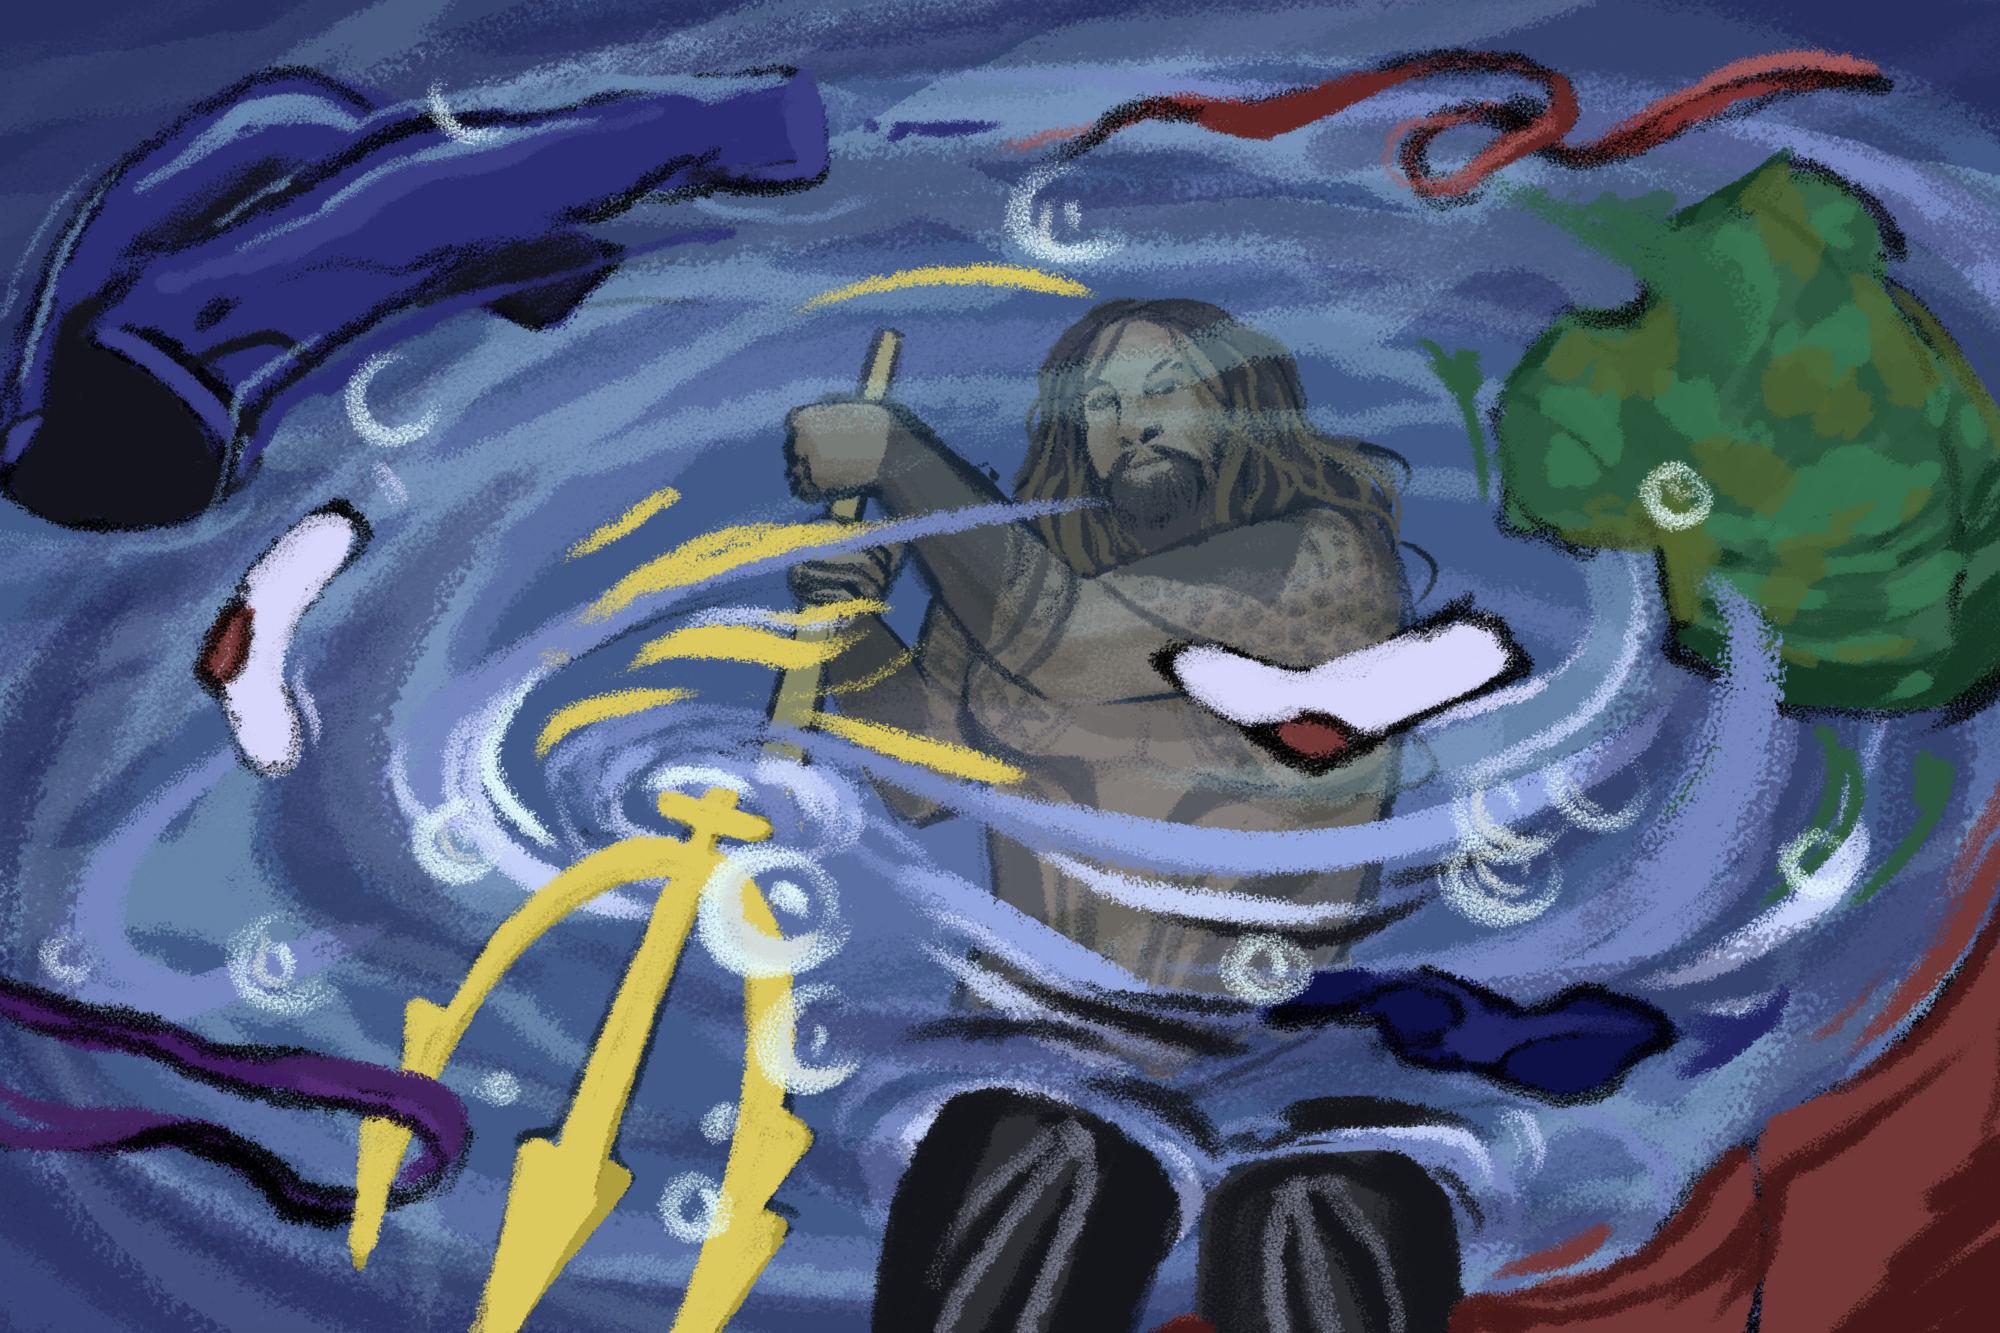 Бог морей, царь стиралок